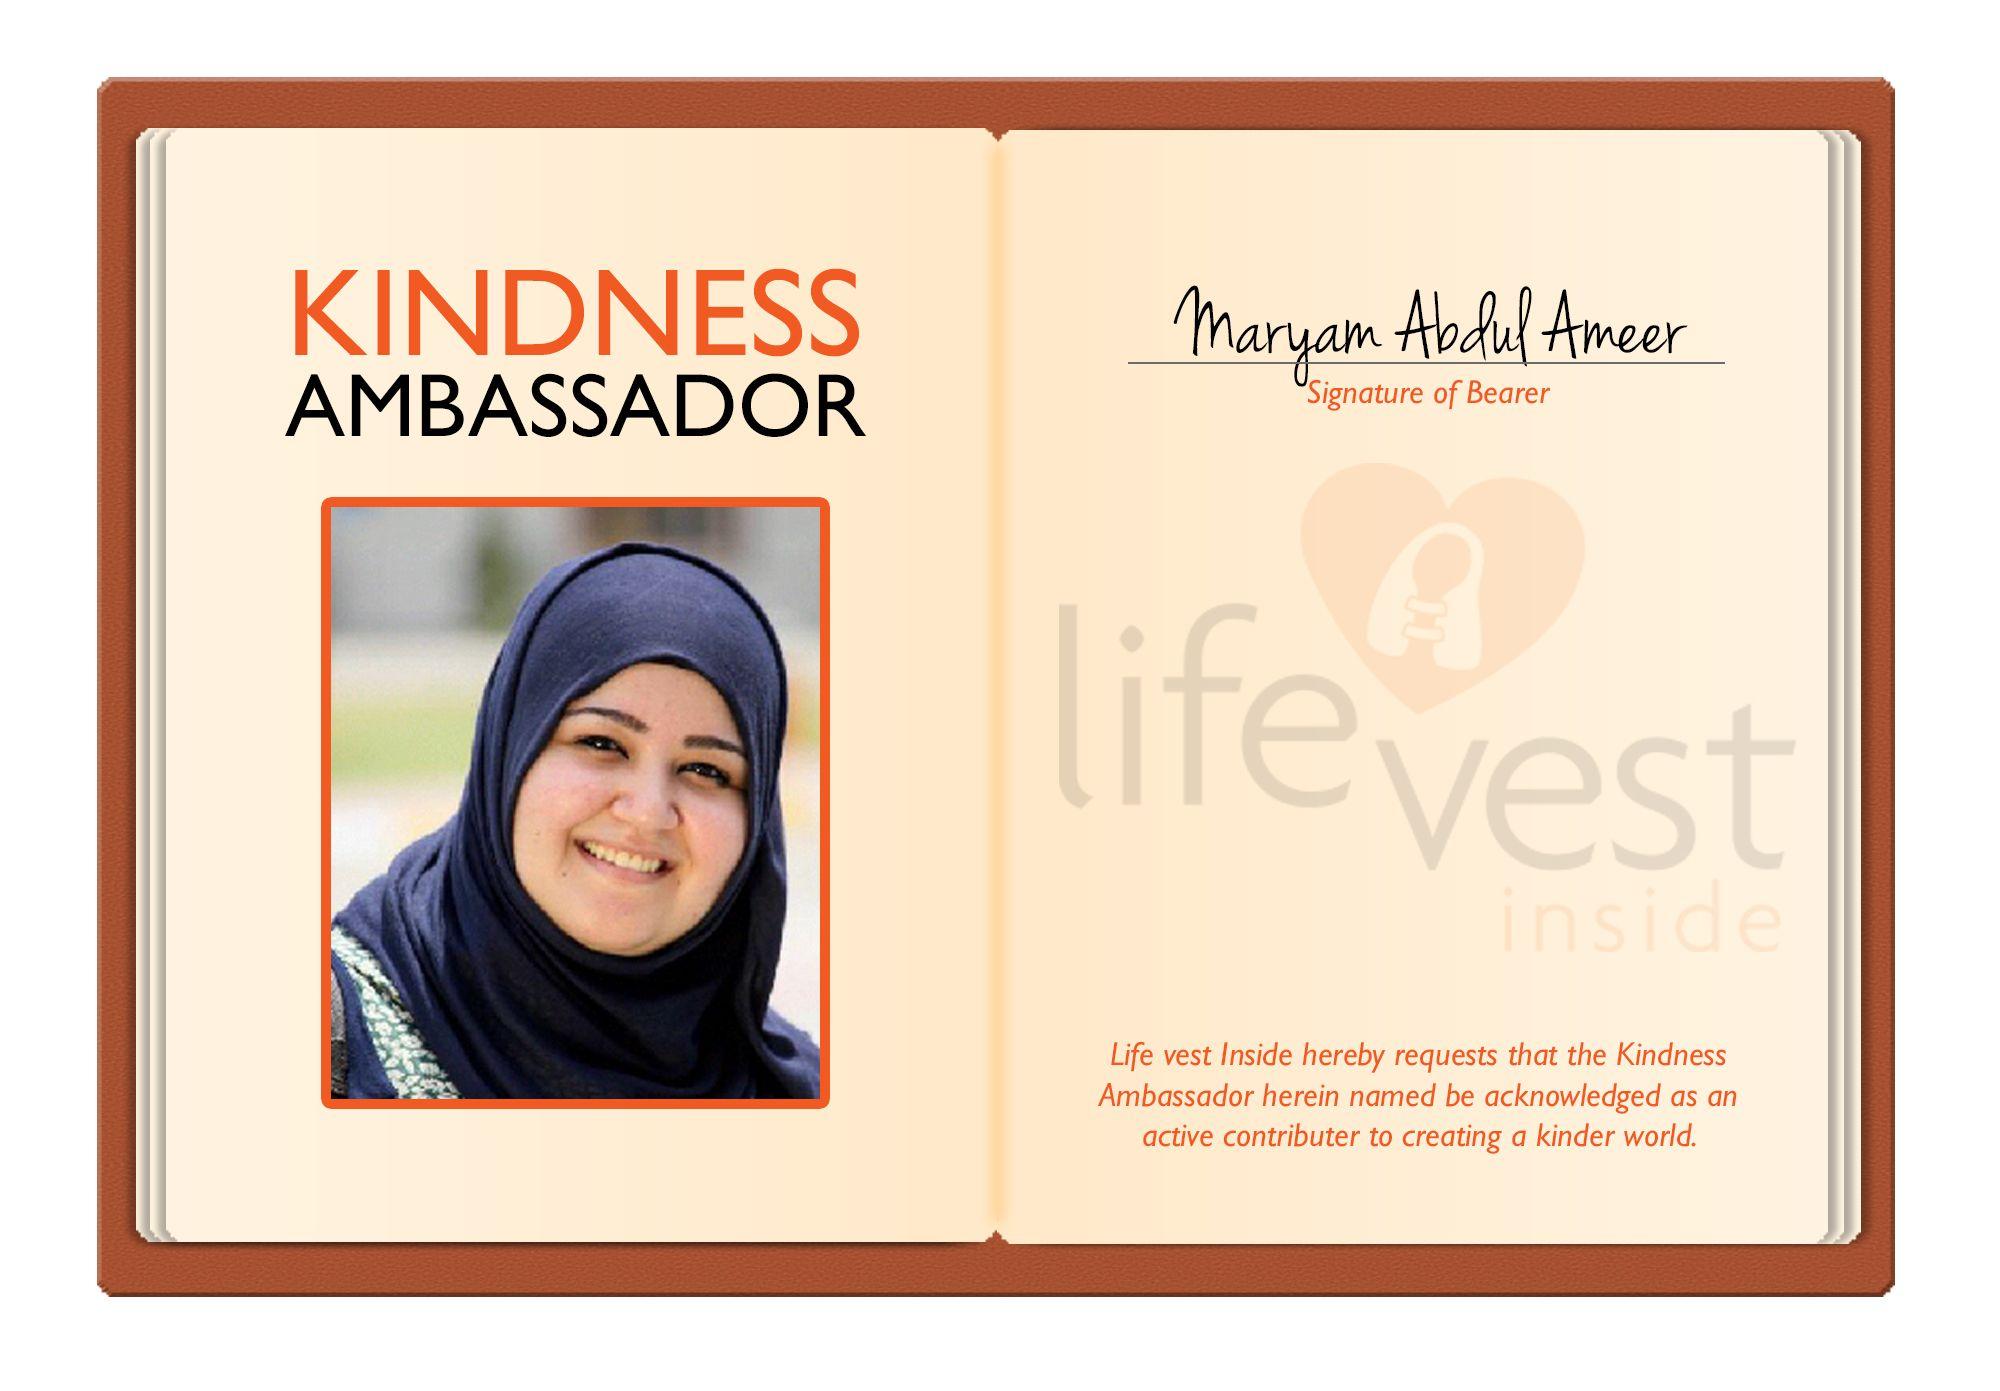 Maryam Abdul Ameer #KindnessRevolution #Ambassador #LifeVestInside